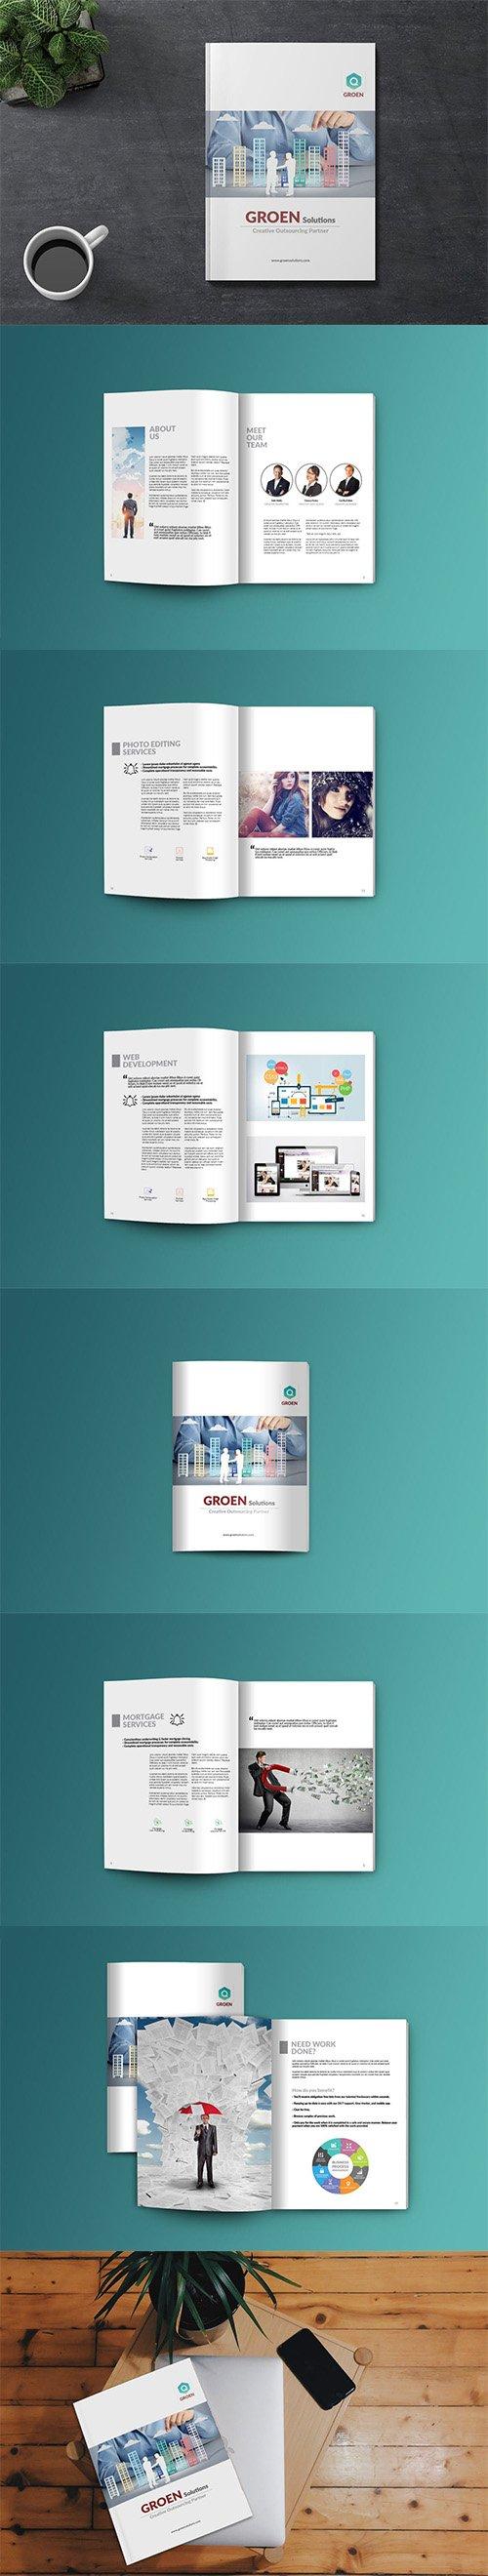 Corporate Indesign Brochure/Megazine